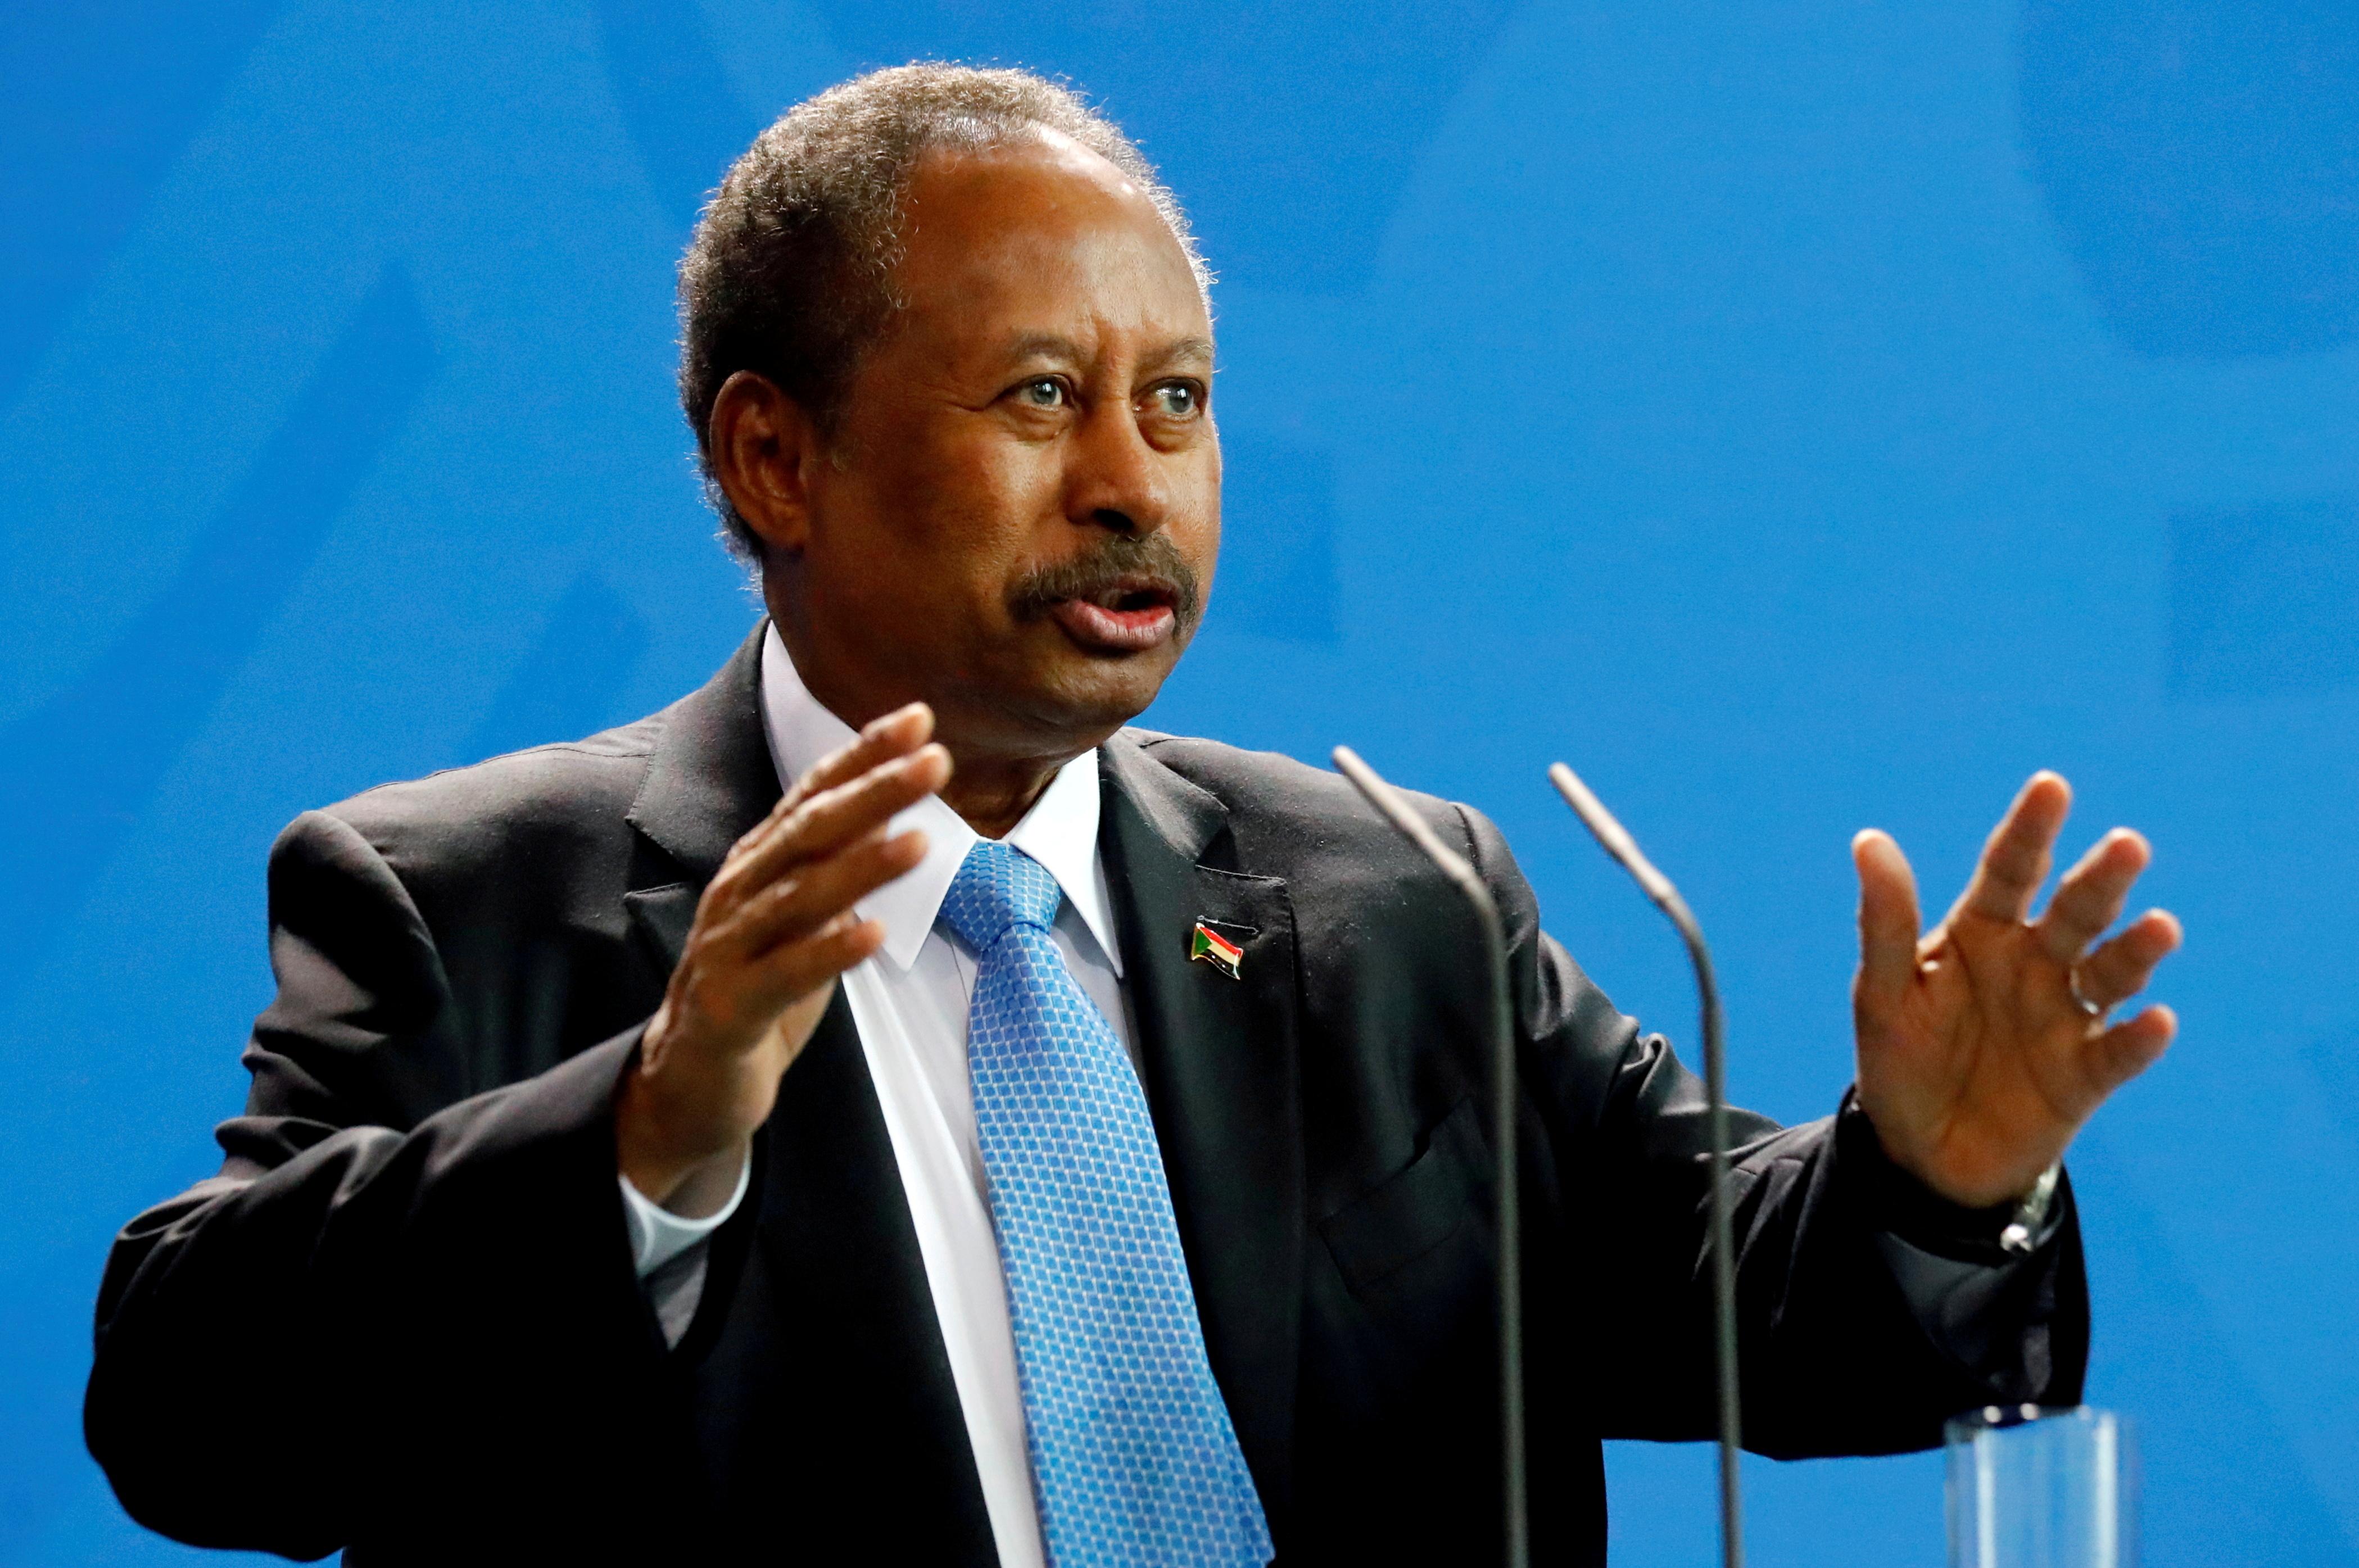 Sudan's PM Hamdok presents road map out of crisis